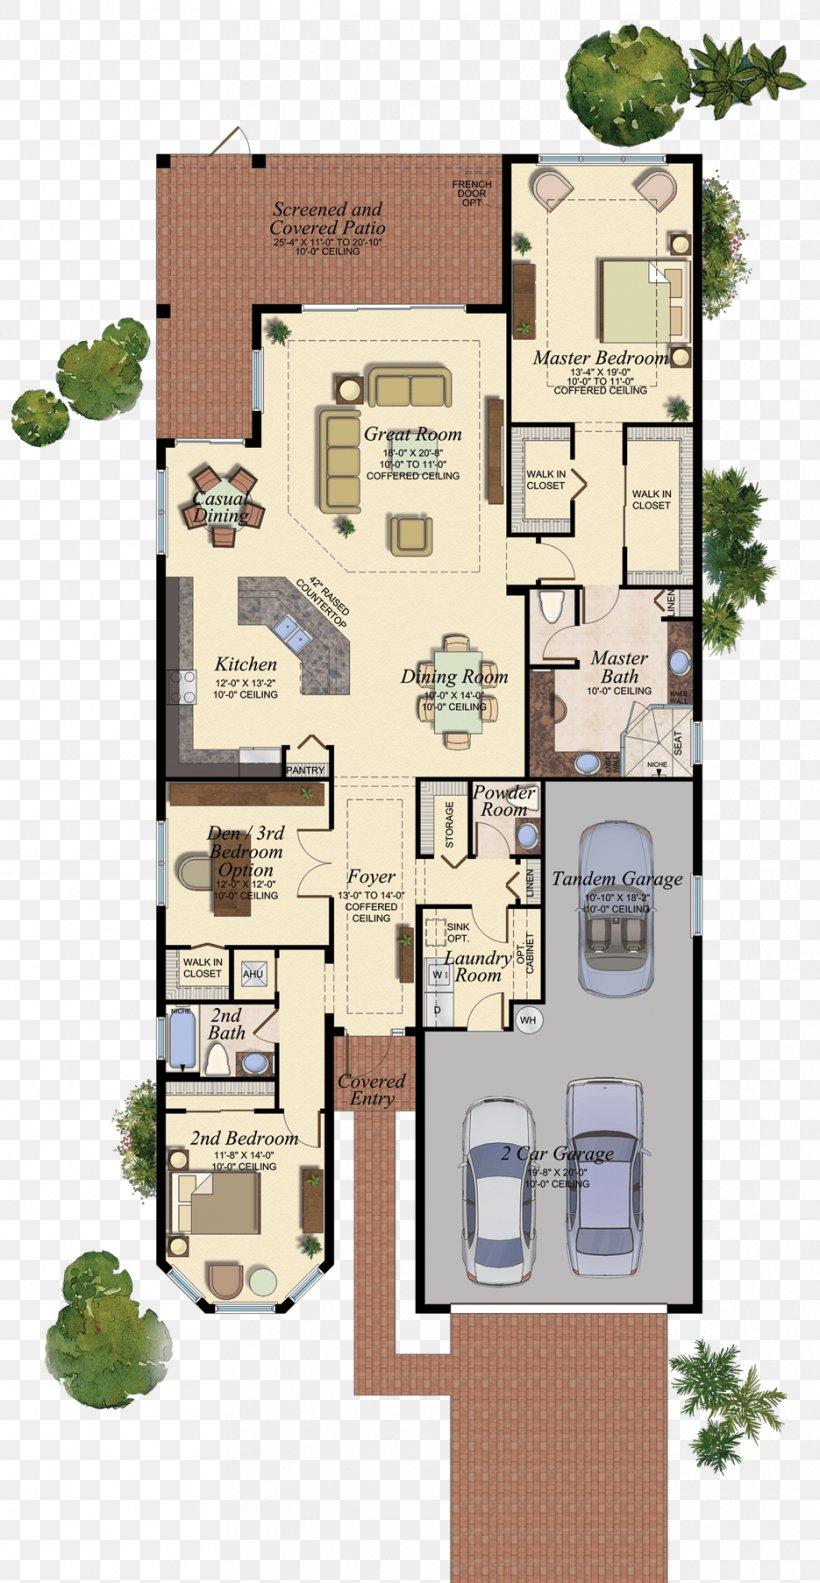 Floor Plan Delray Beach House Plan, PNG